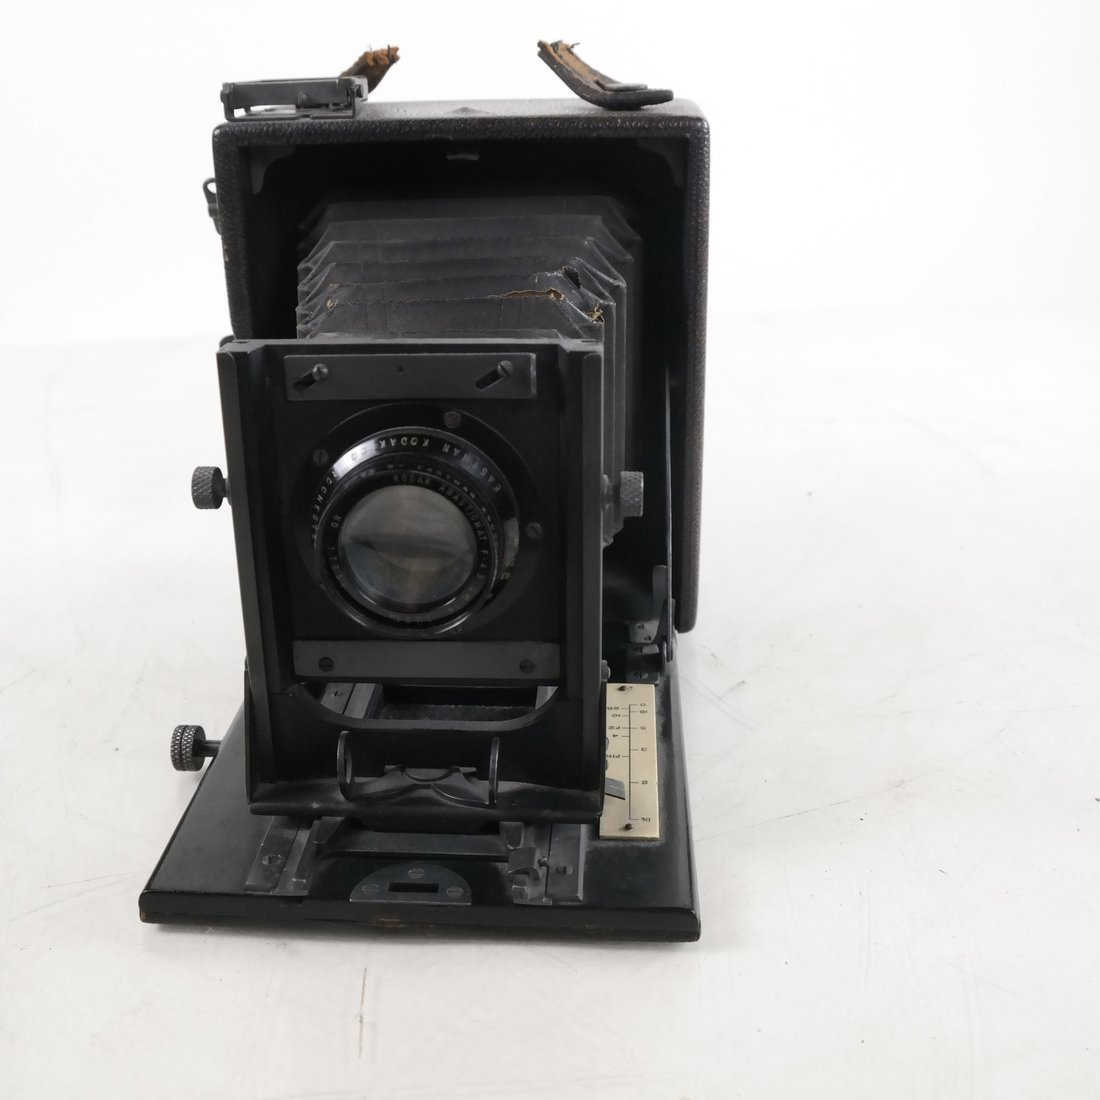 Kodak Premo Camera